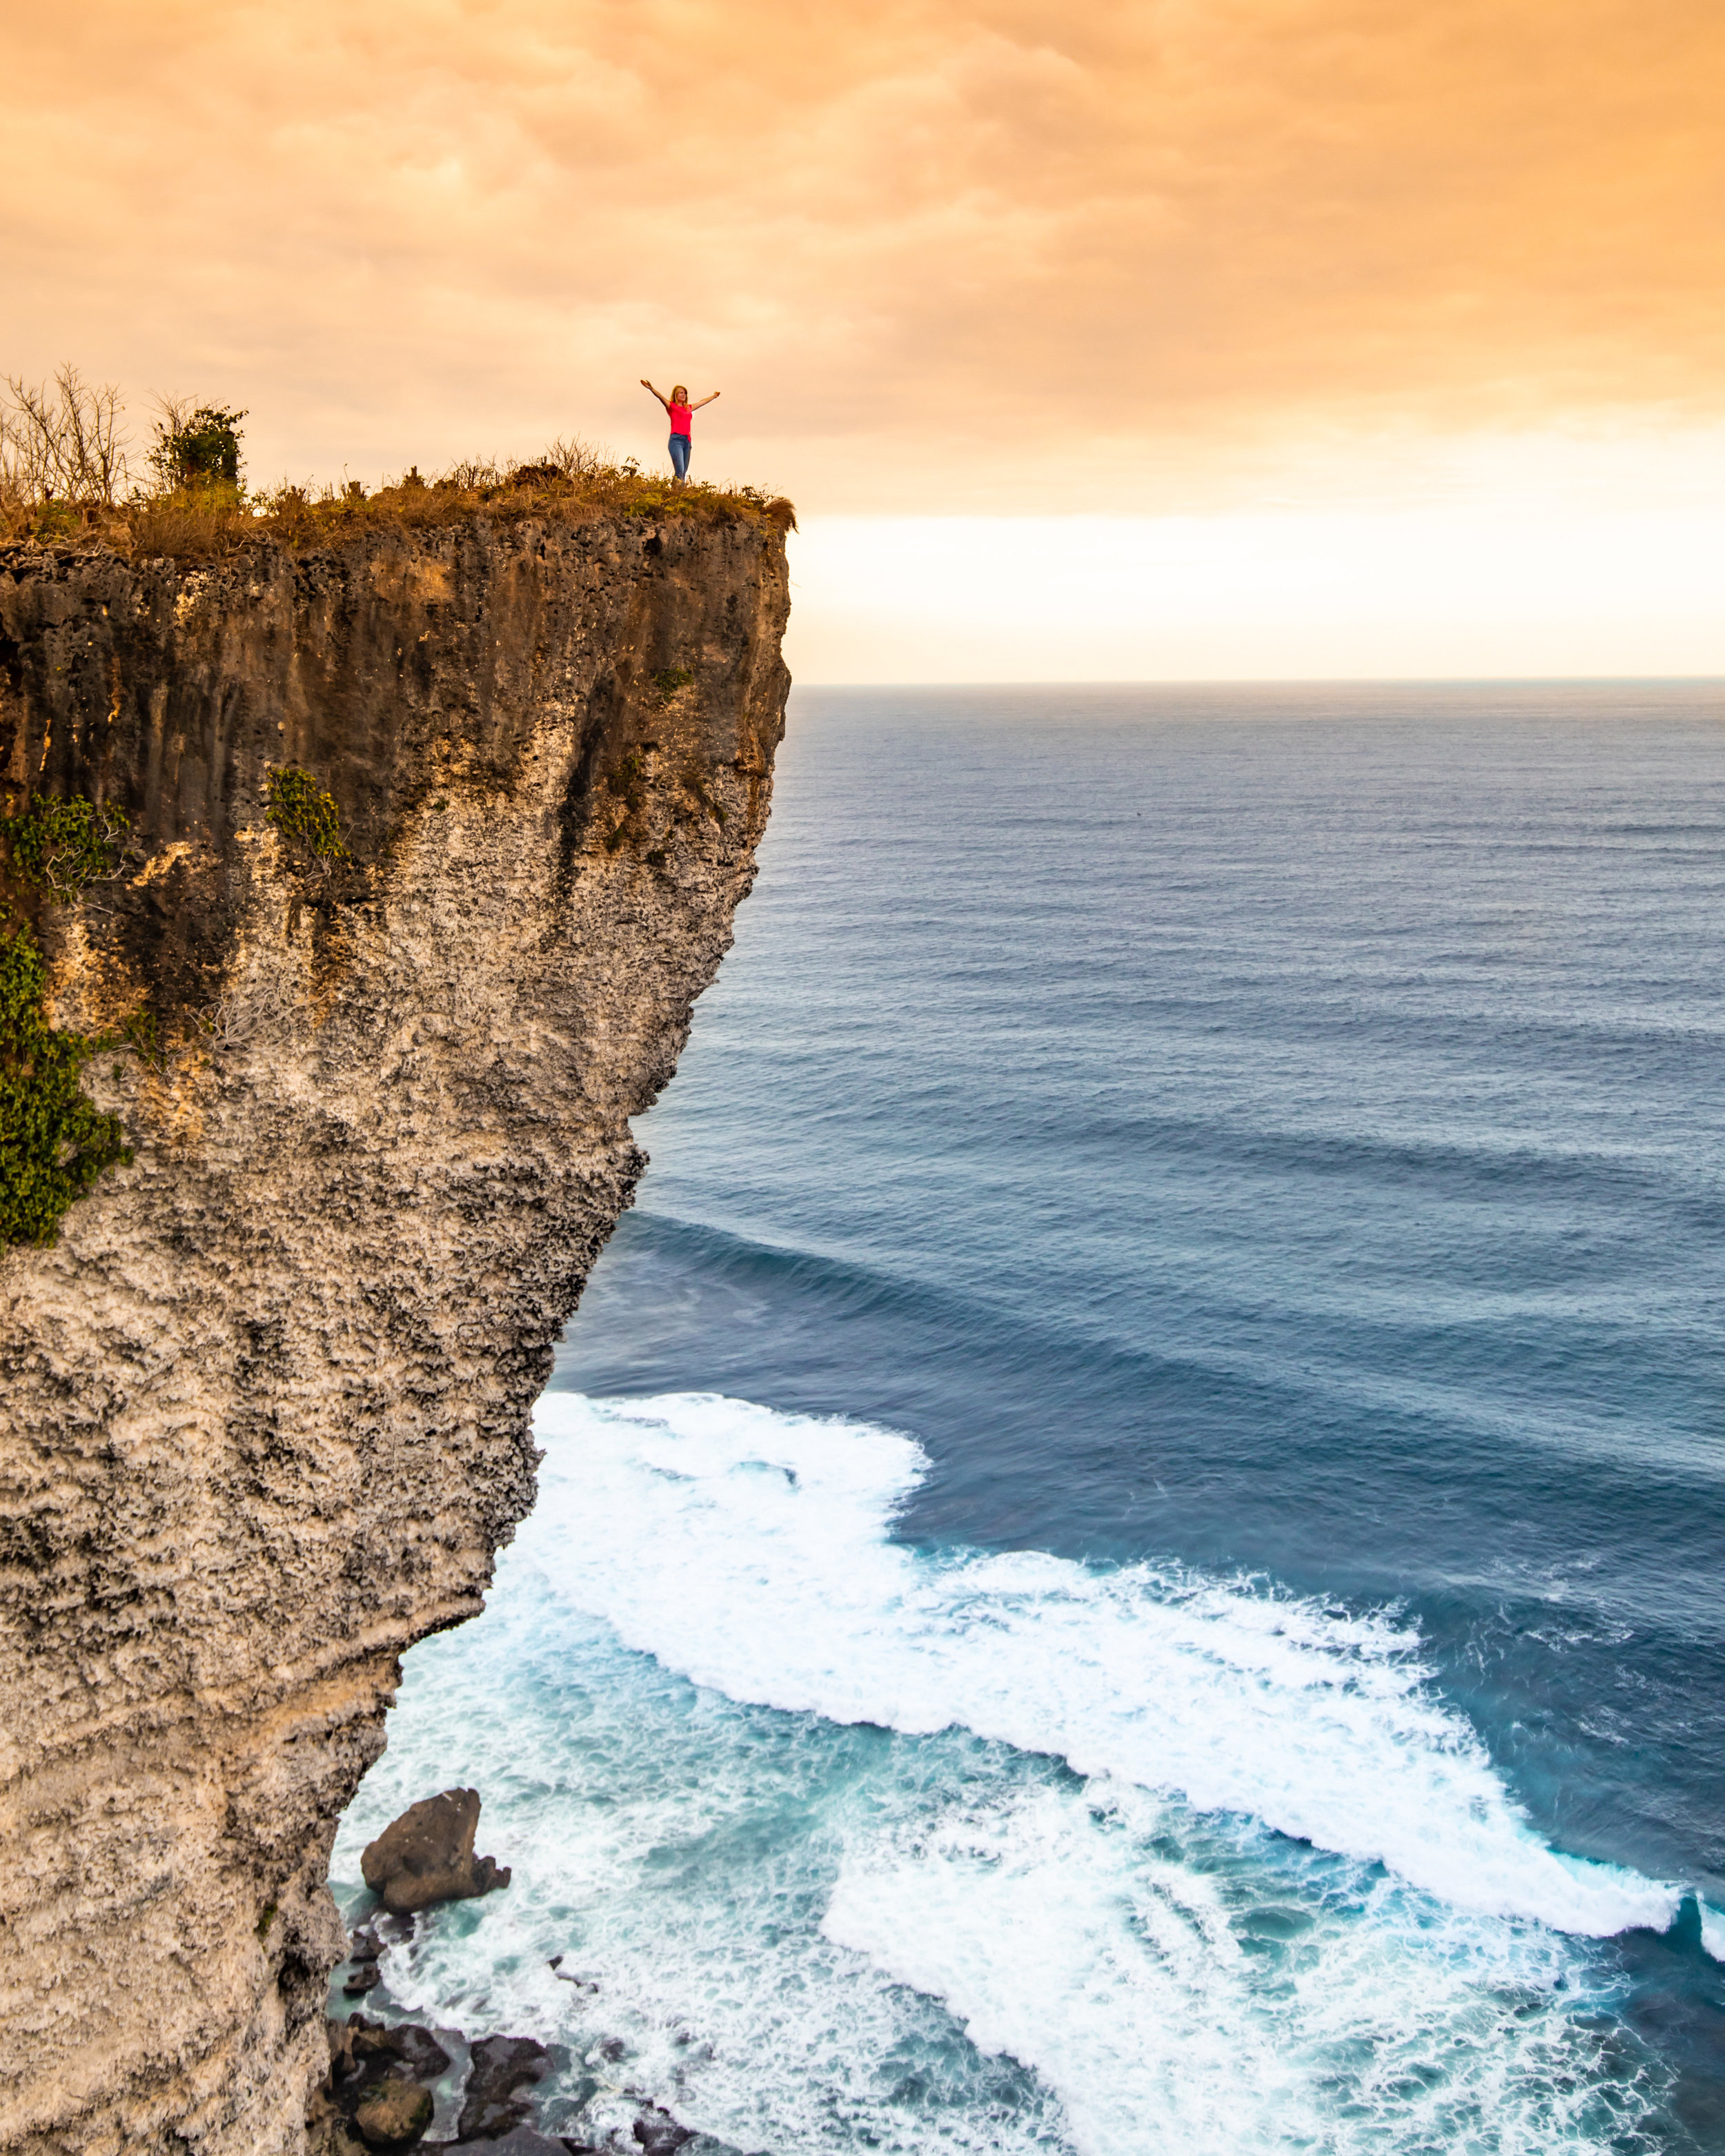 Karang Boma Cliff - Photogenic places in Bali